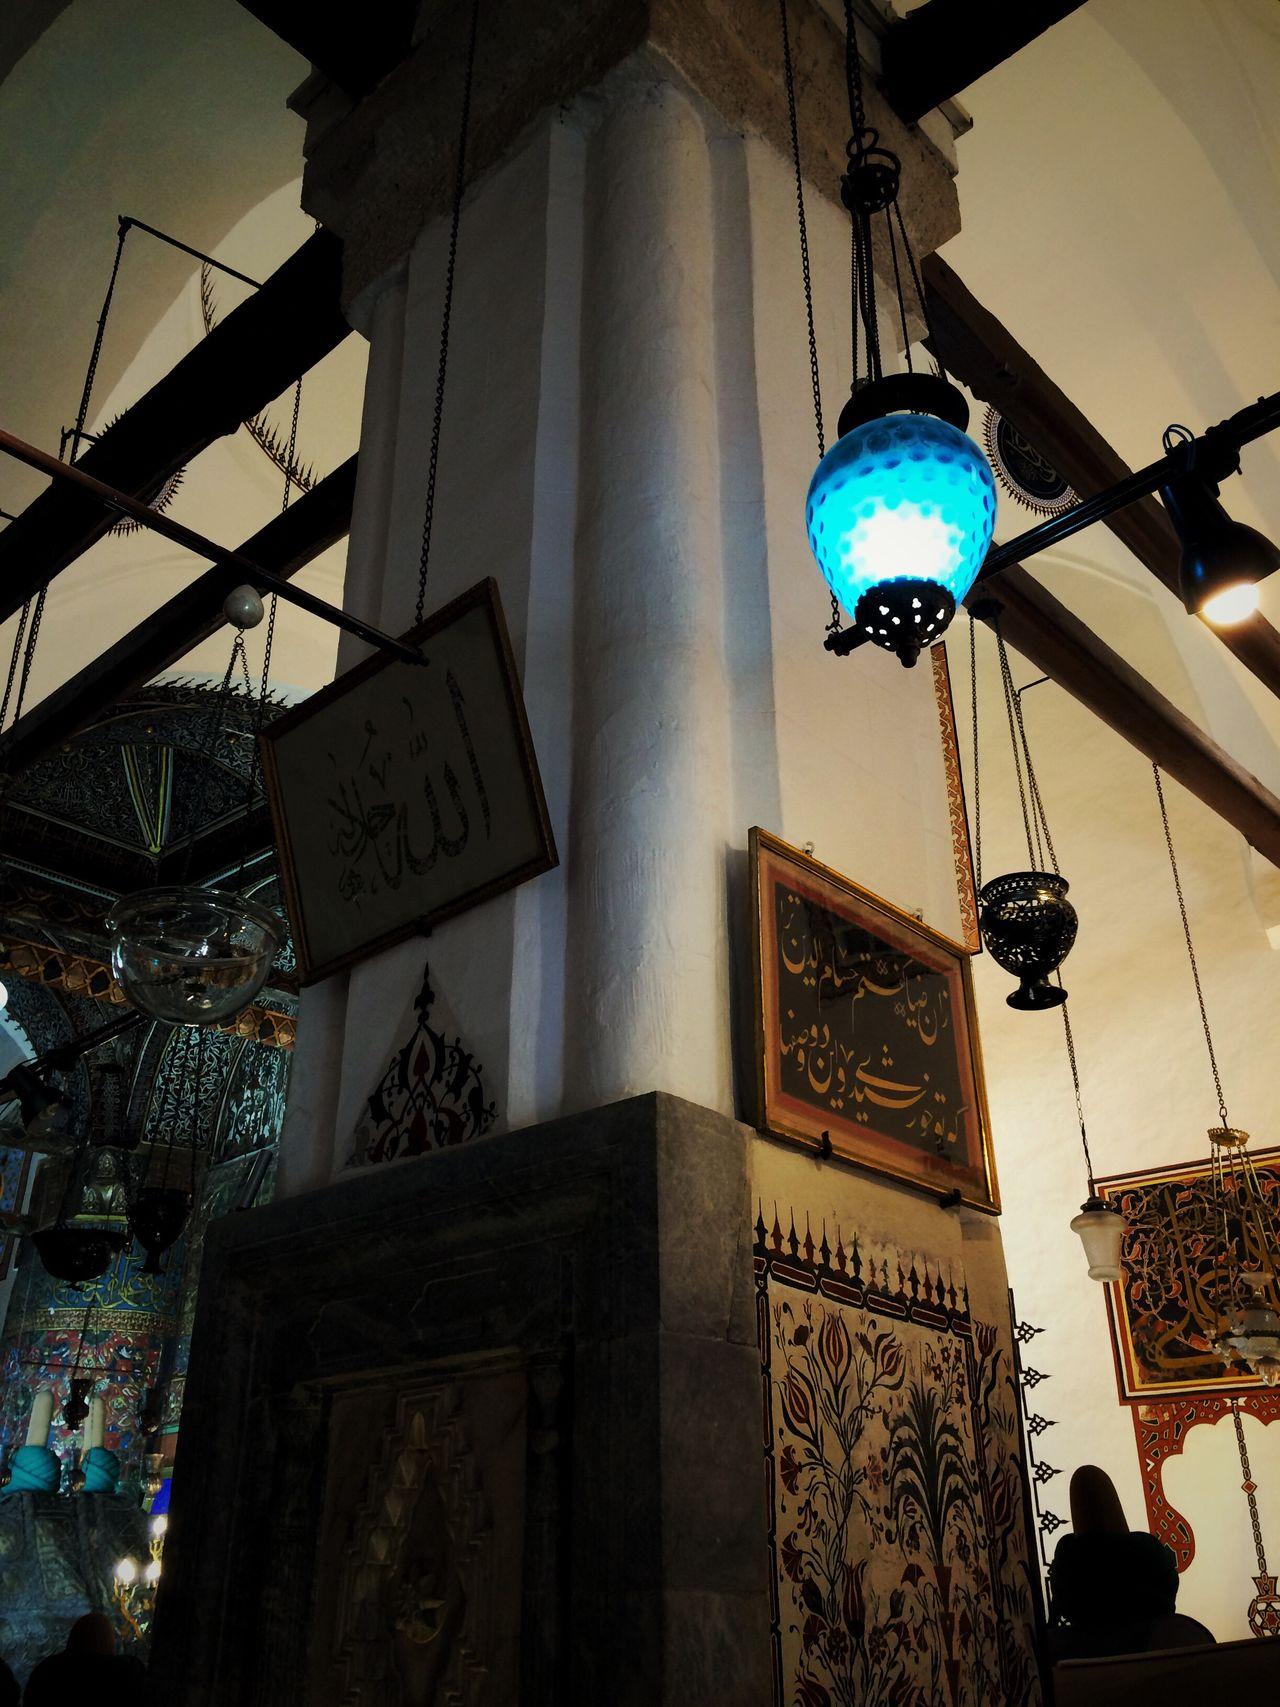 Bkue Sky No People Retro Style City Elégance Vintage Love ♥ Mevlana Türbesi Mevlana Mosque Konya Turkey Konya Turkey (null)History Rear View Retro